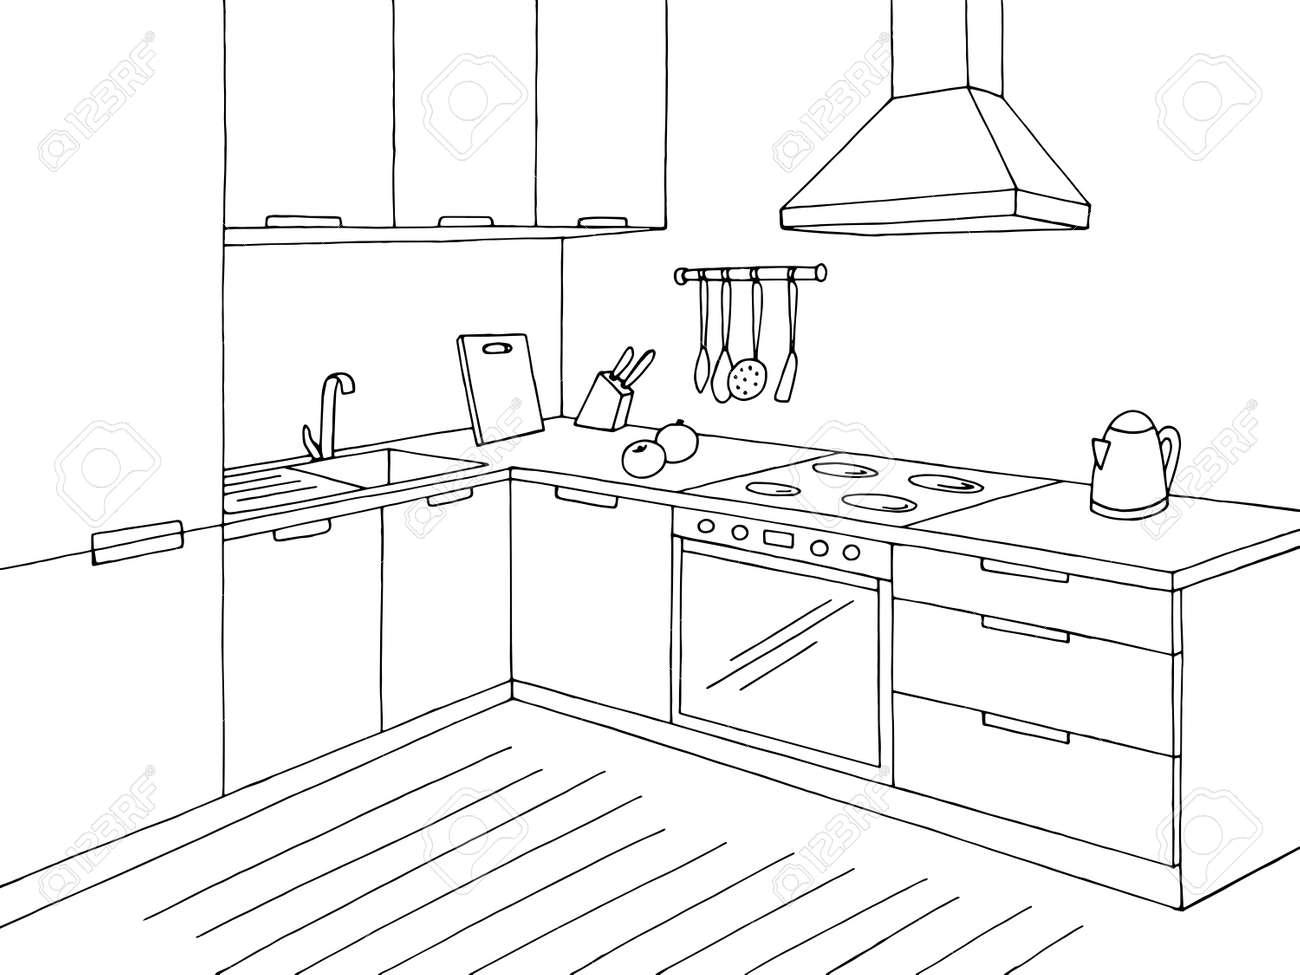 Kitchen room graphic black white home interior sketch illustration vector - 133292906